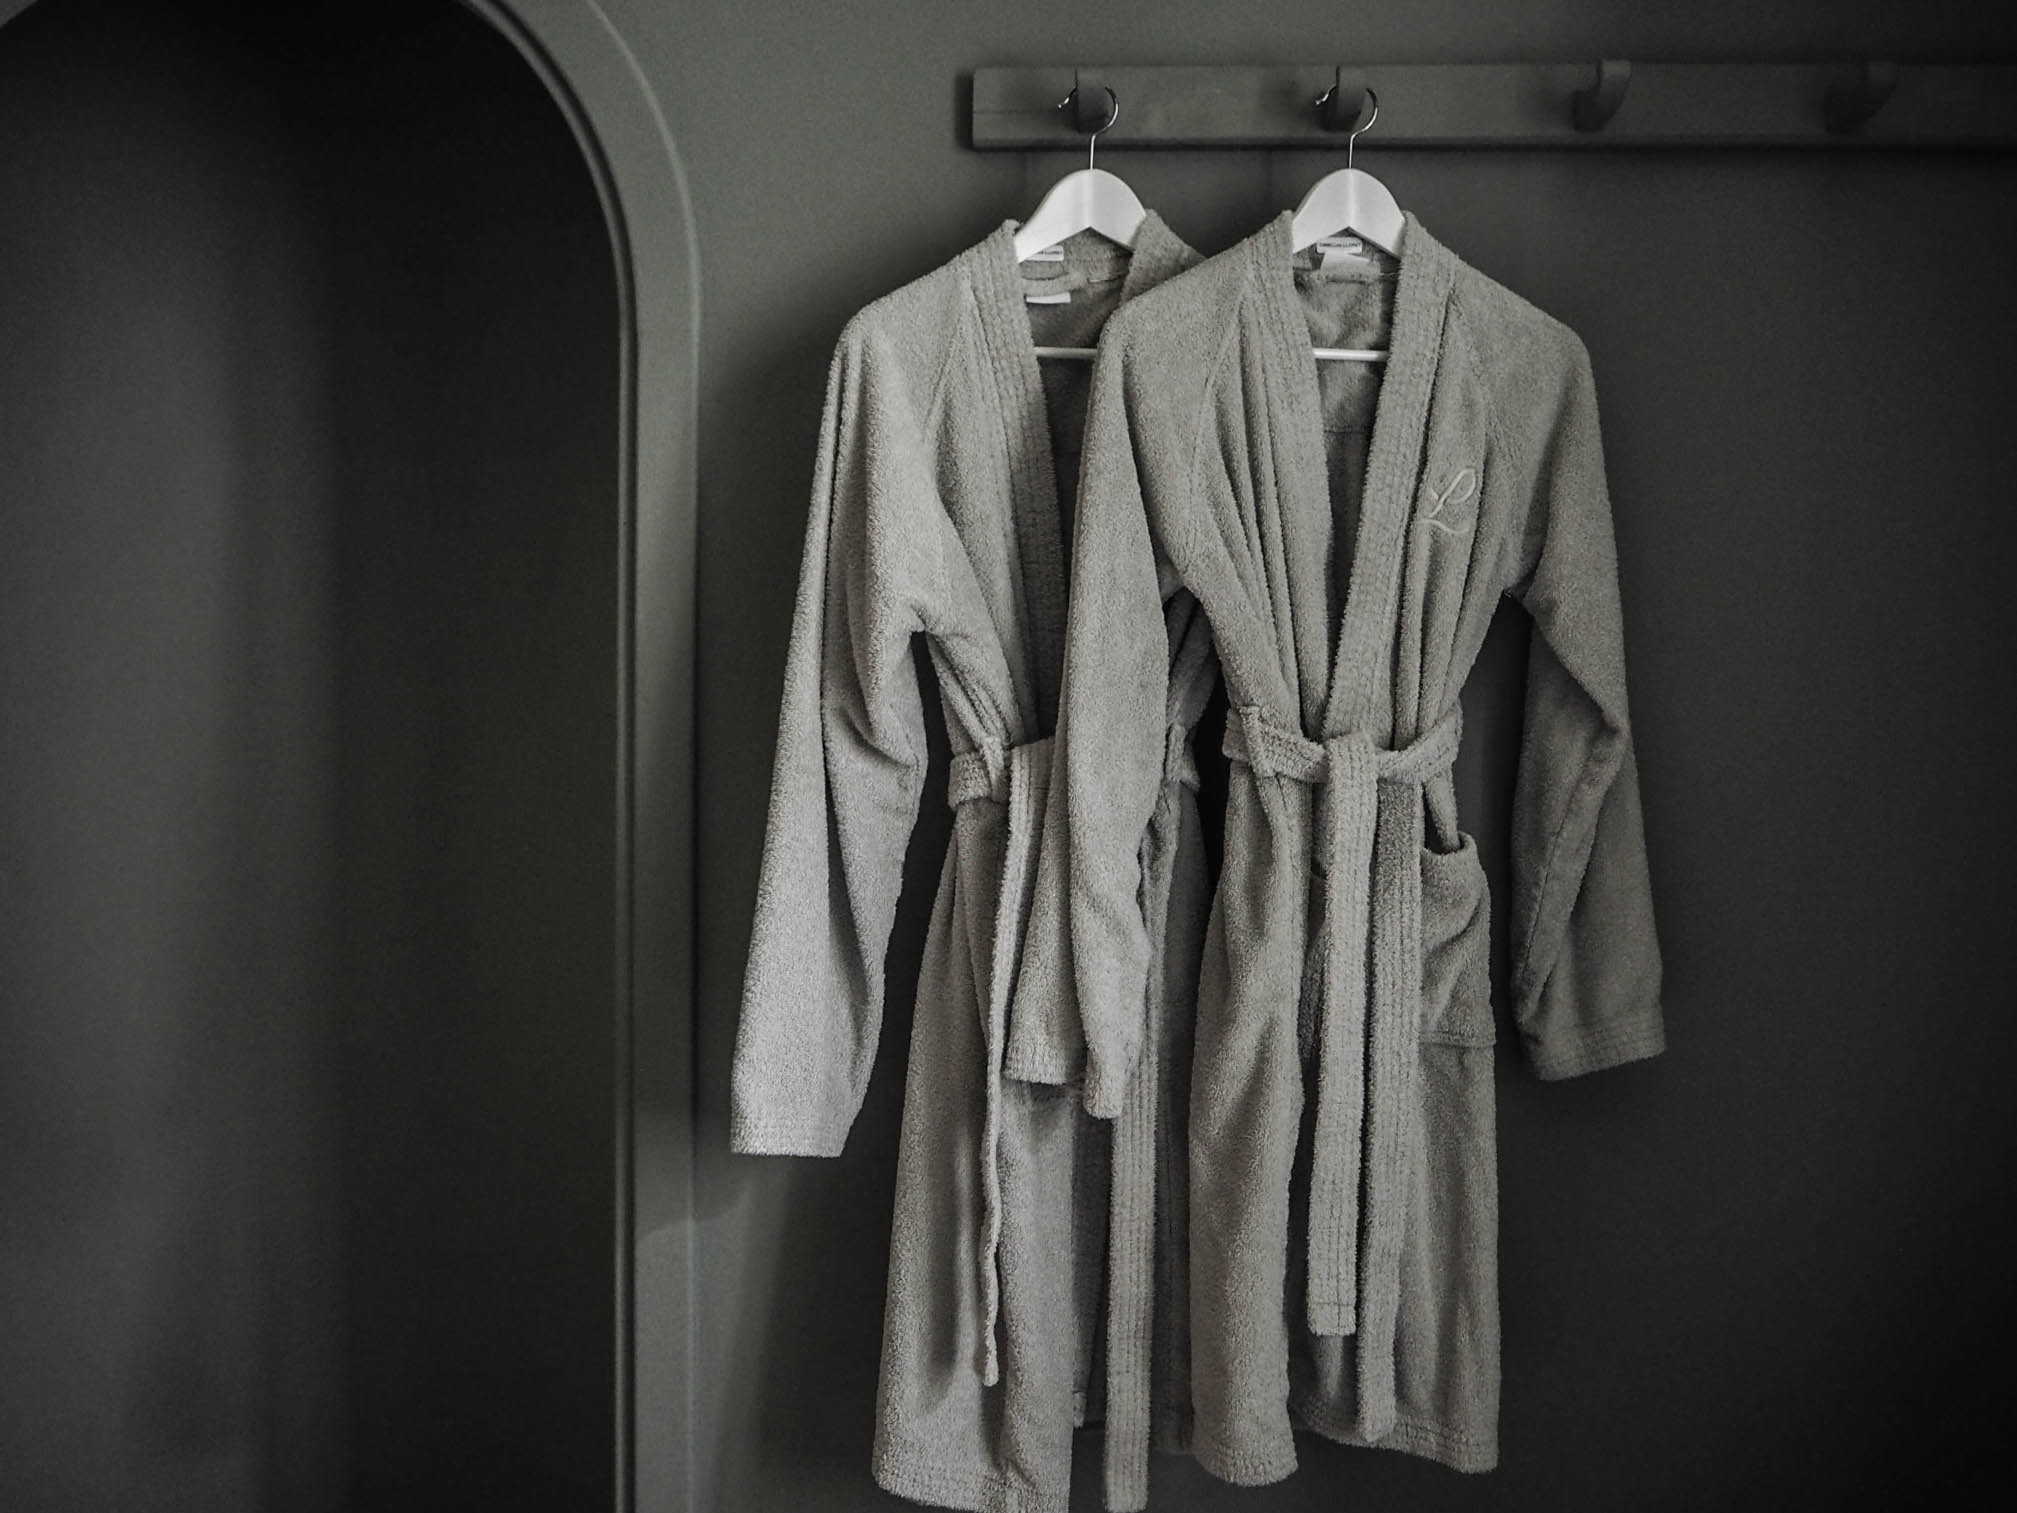 camellas-lloret-maison-d'hotes-room2-robes.jpg